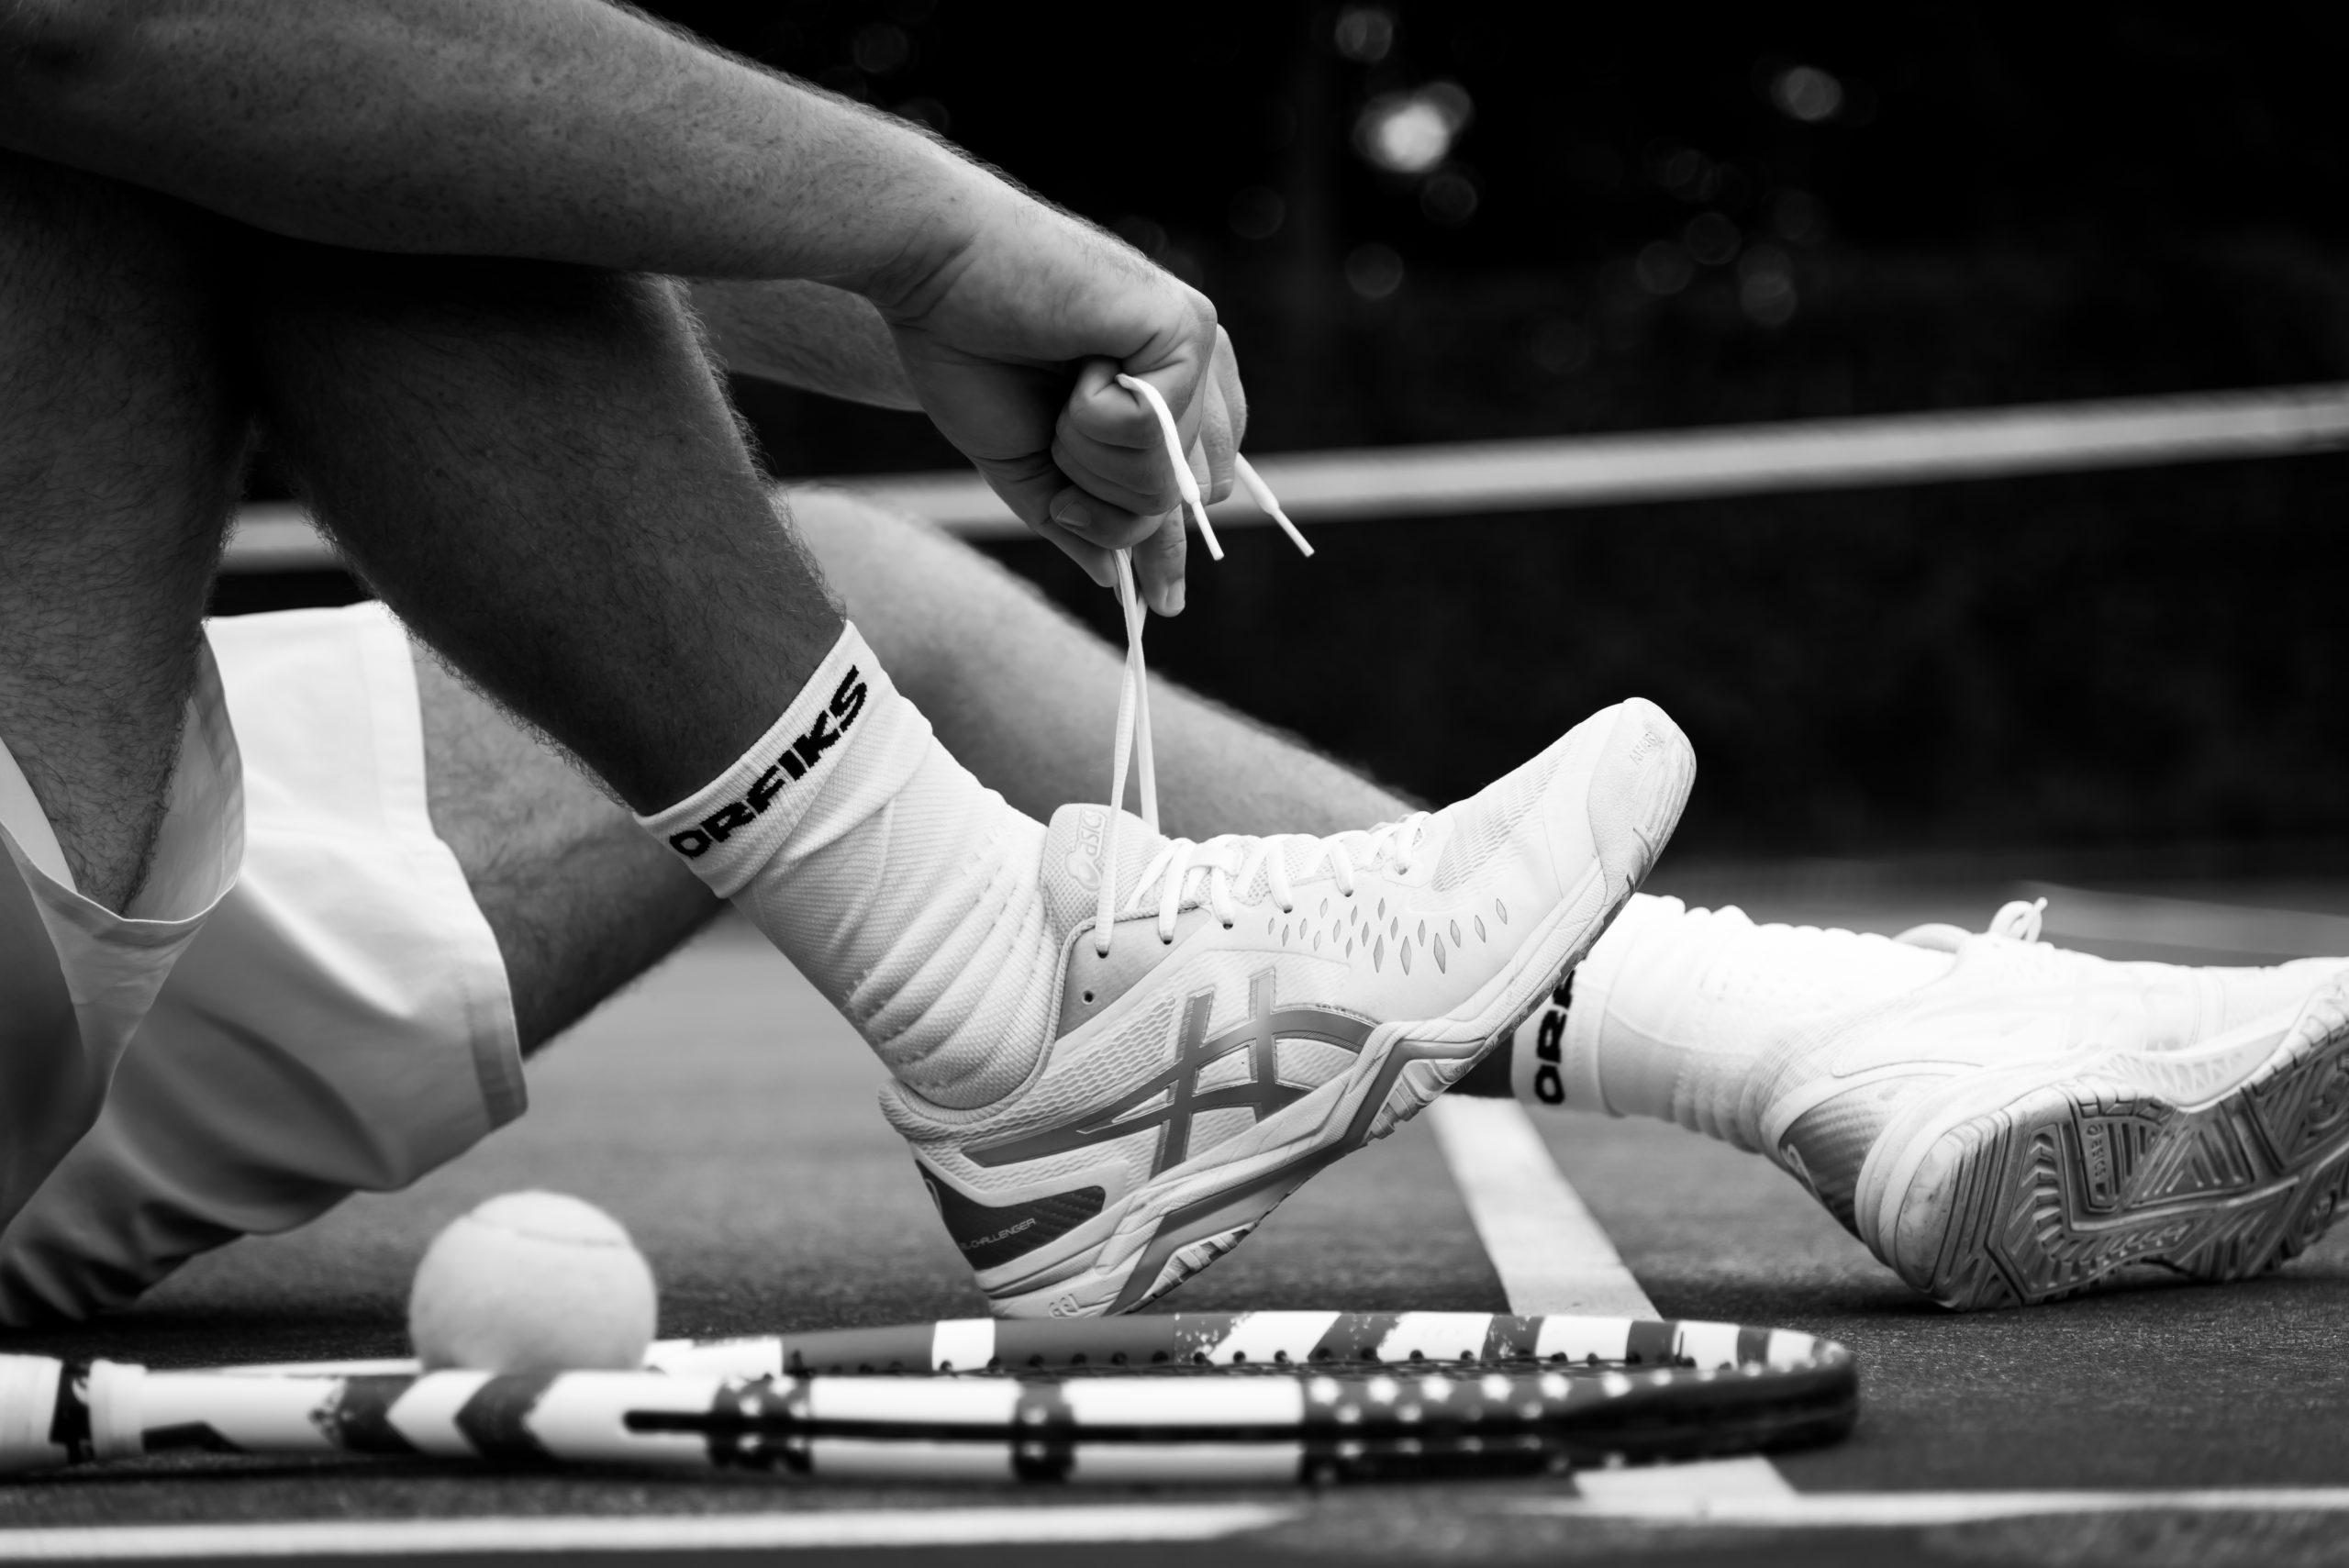 Orfiks Socks, Product Photo, by Garrick Hoffman Photography